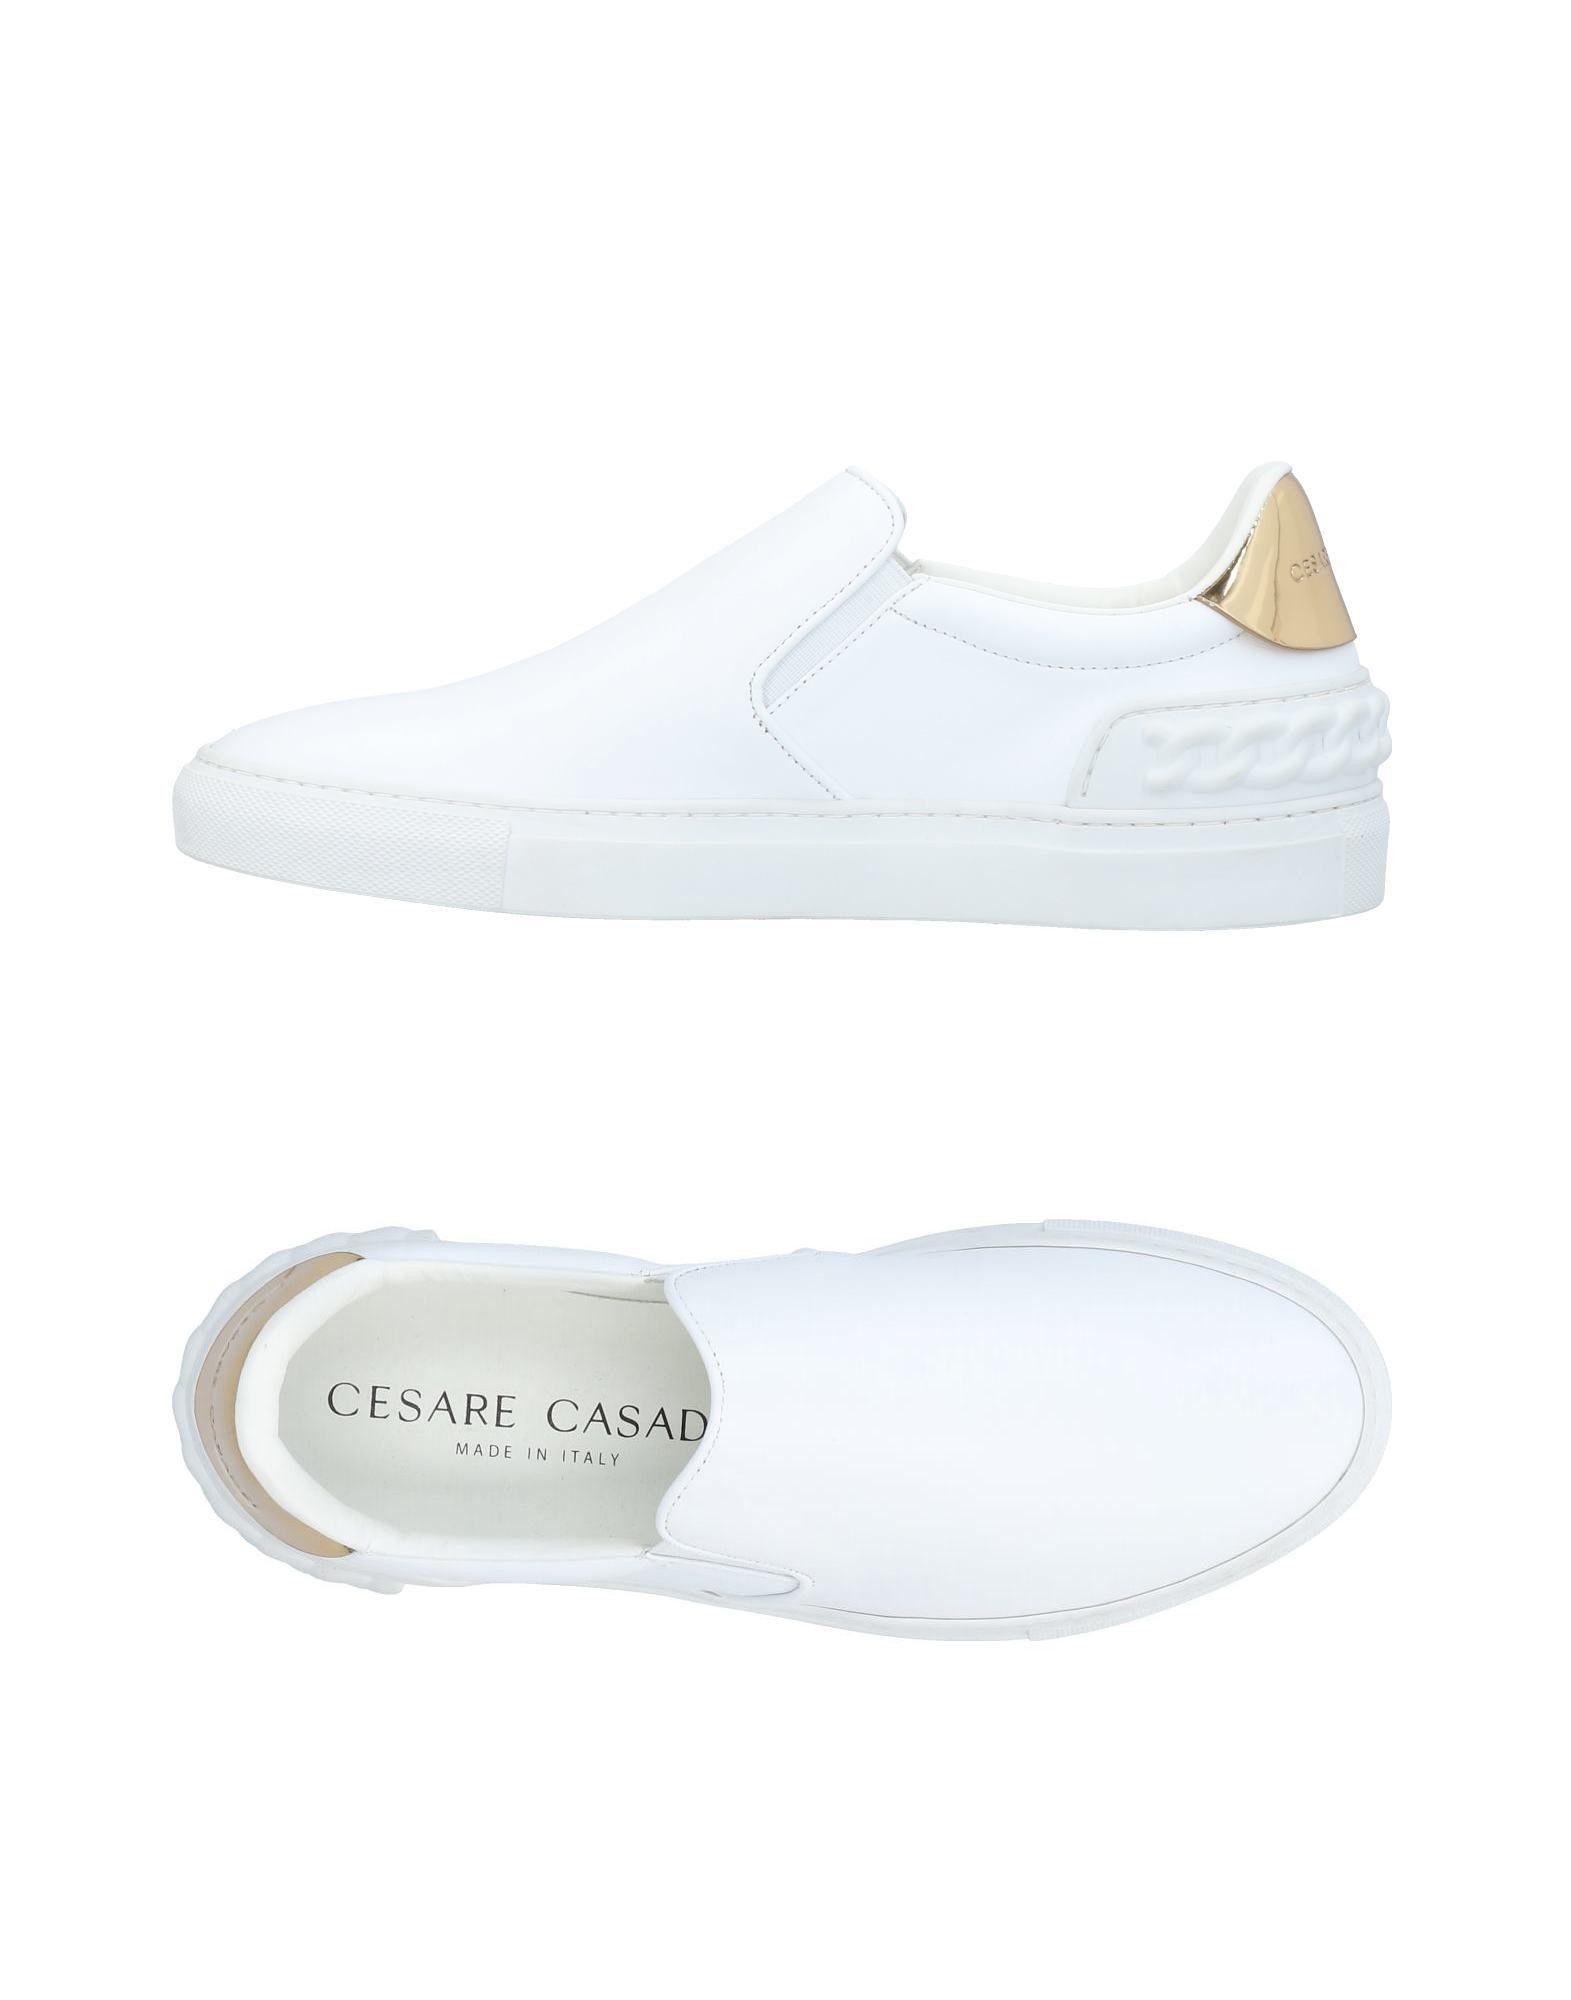 Cesare Casadei Sneakers Herren  11453068WT Gute Qualität beliebte Schuhe